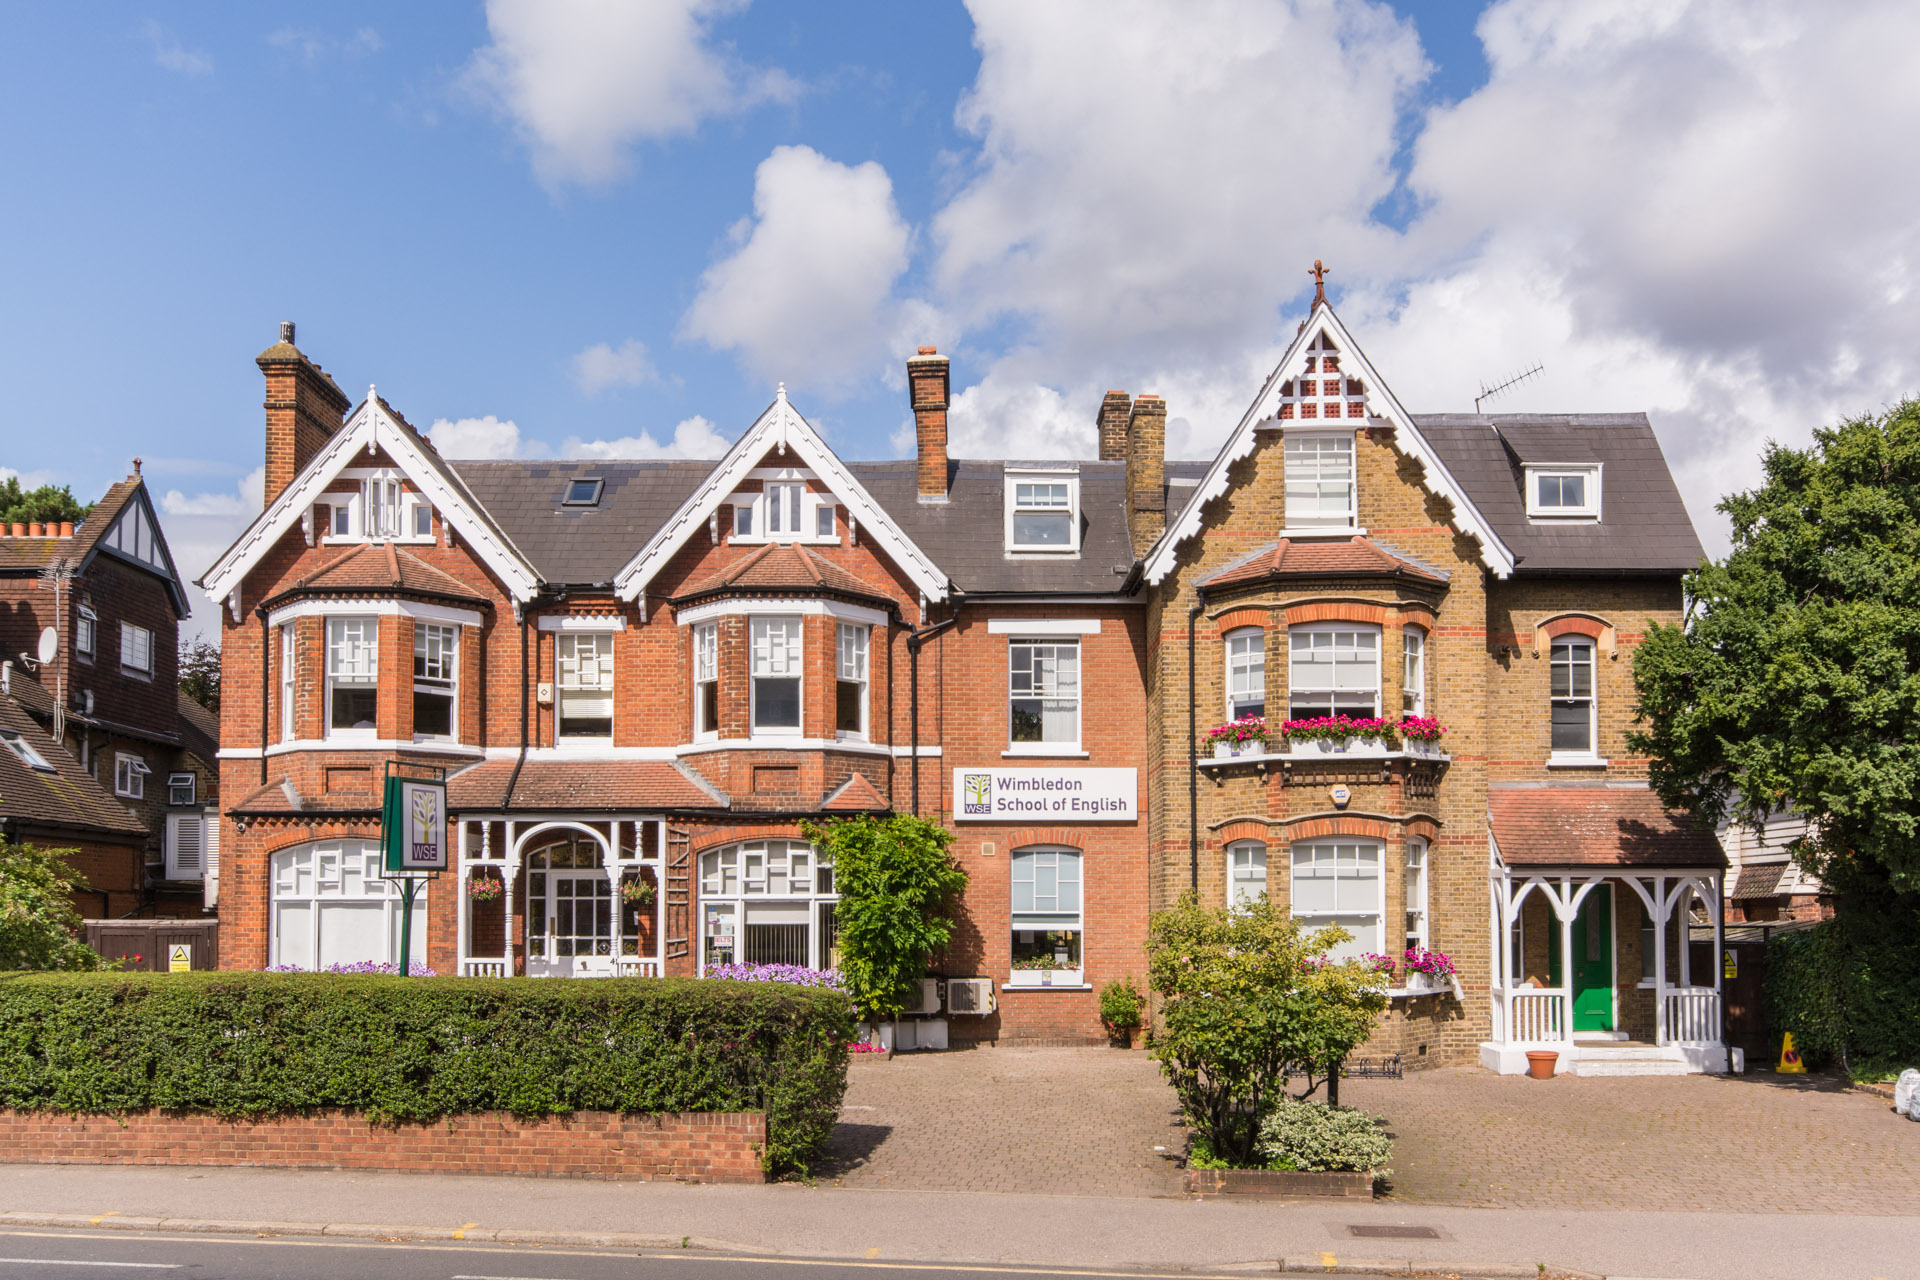 Wimbledon School of English Building